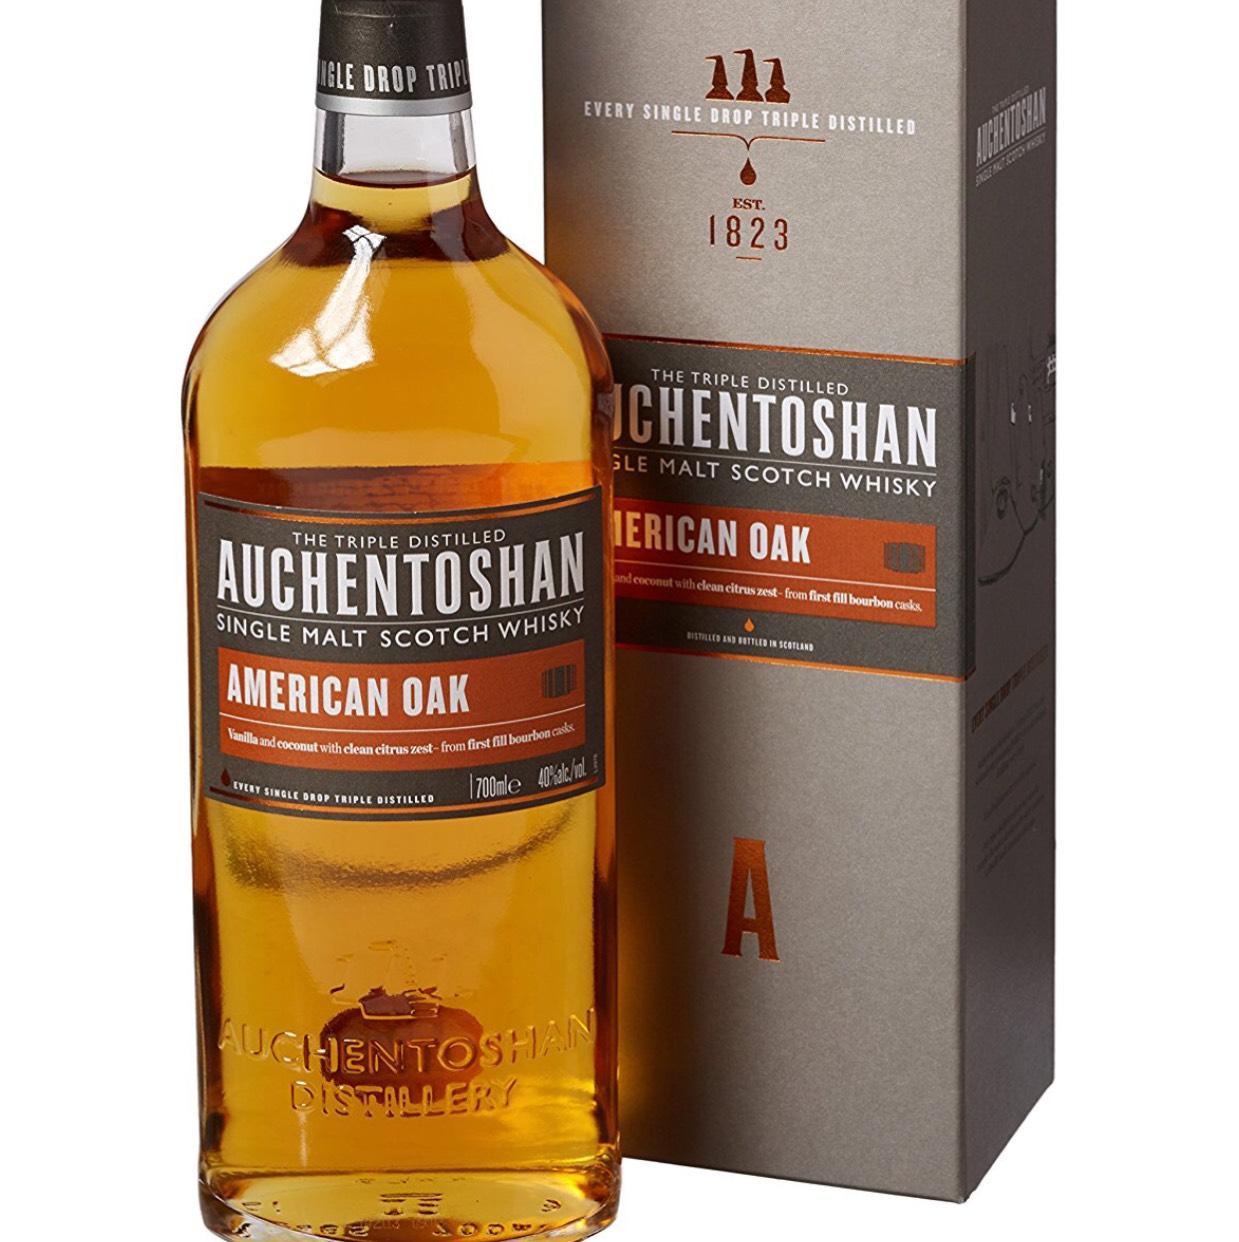 Auchentoshan American Oak Single Malt Scotch Whisky - £20 @ Amazon (Prime Exclusive)